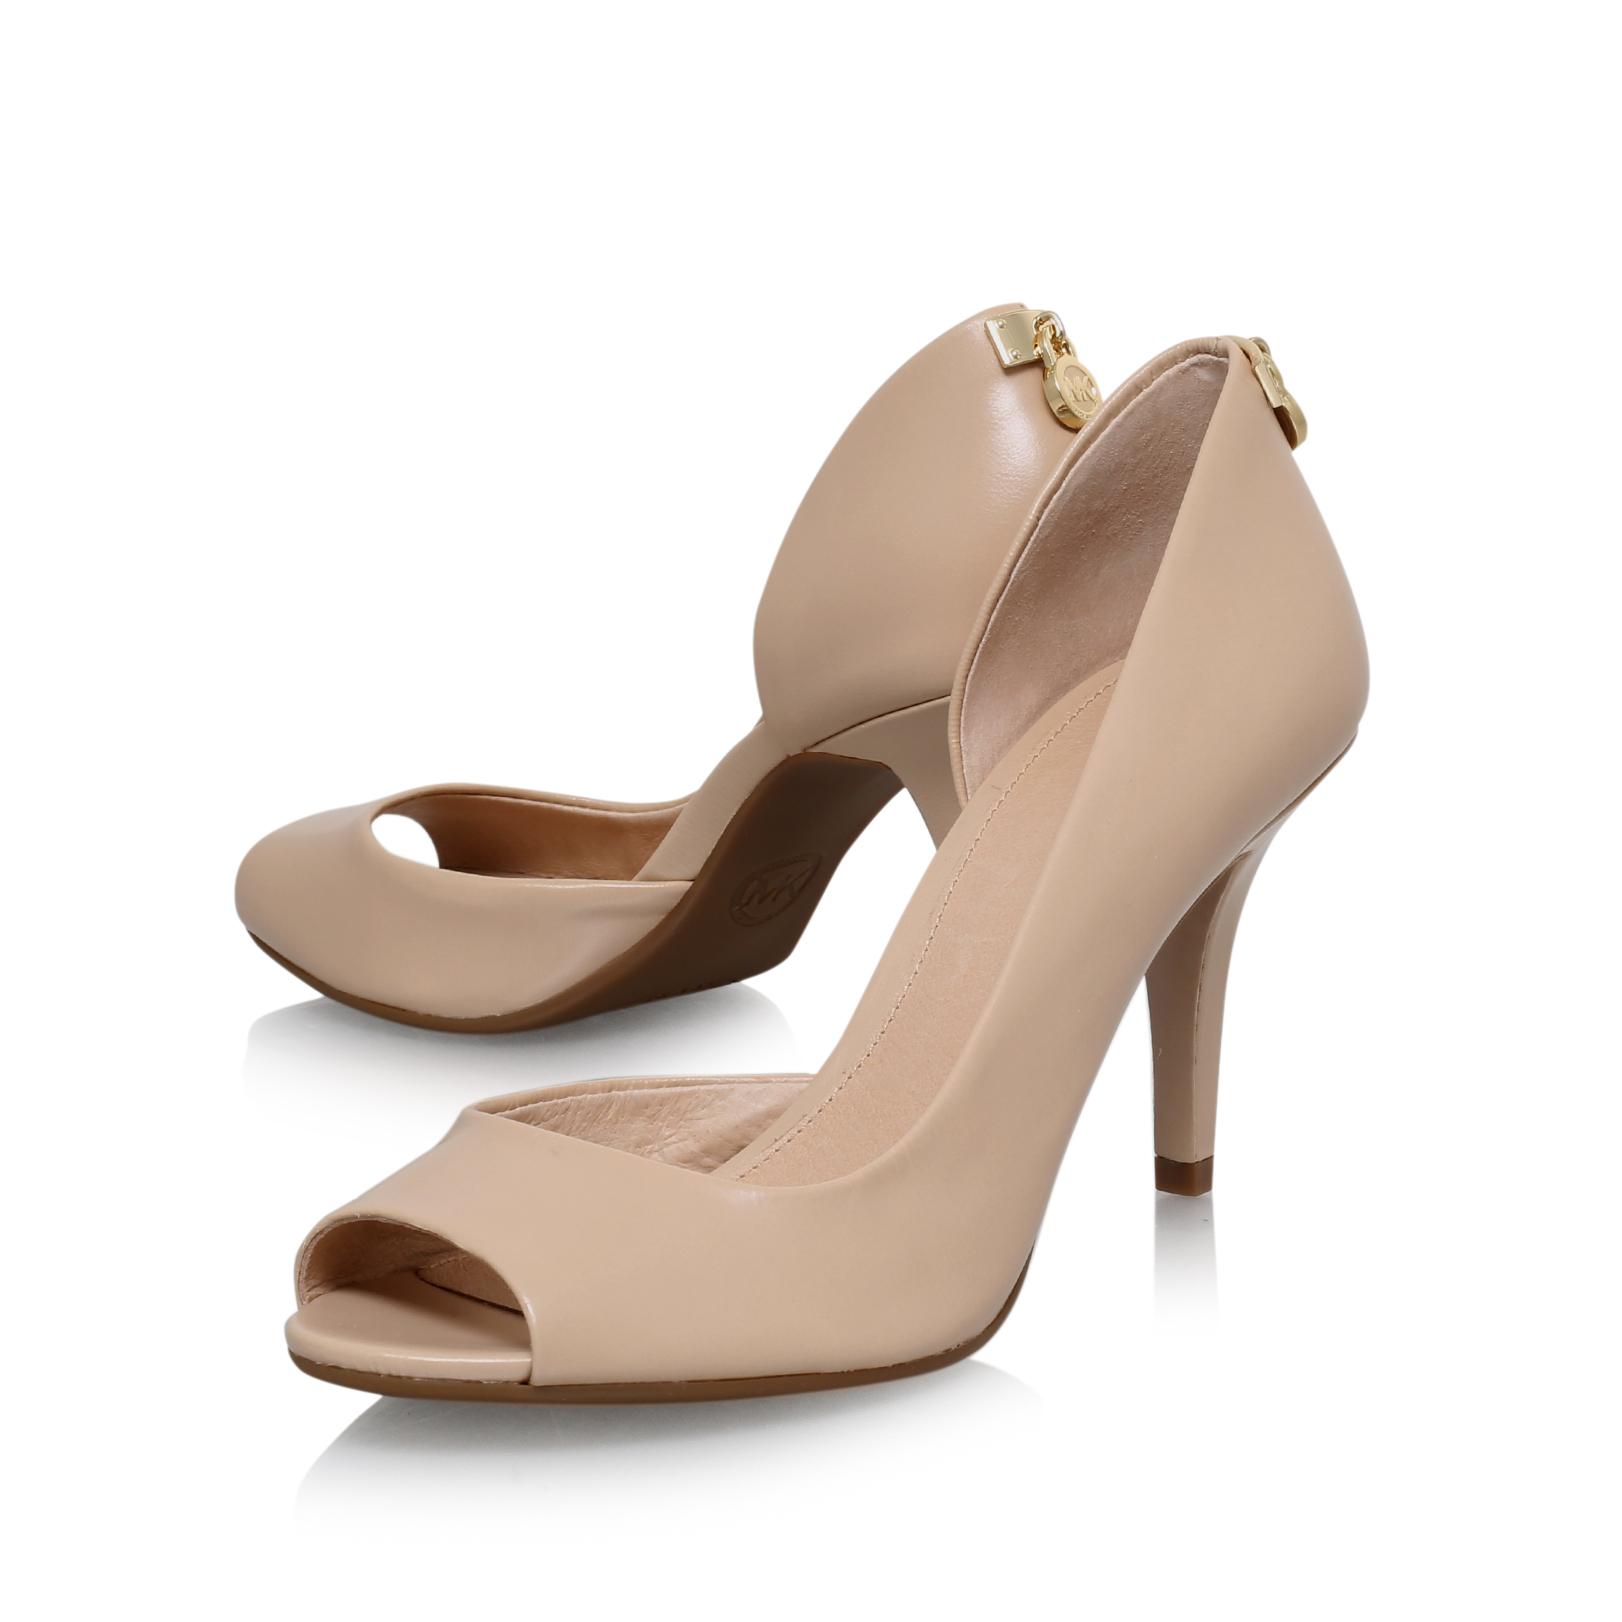 Amazon Women Shoe Brands